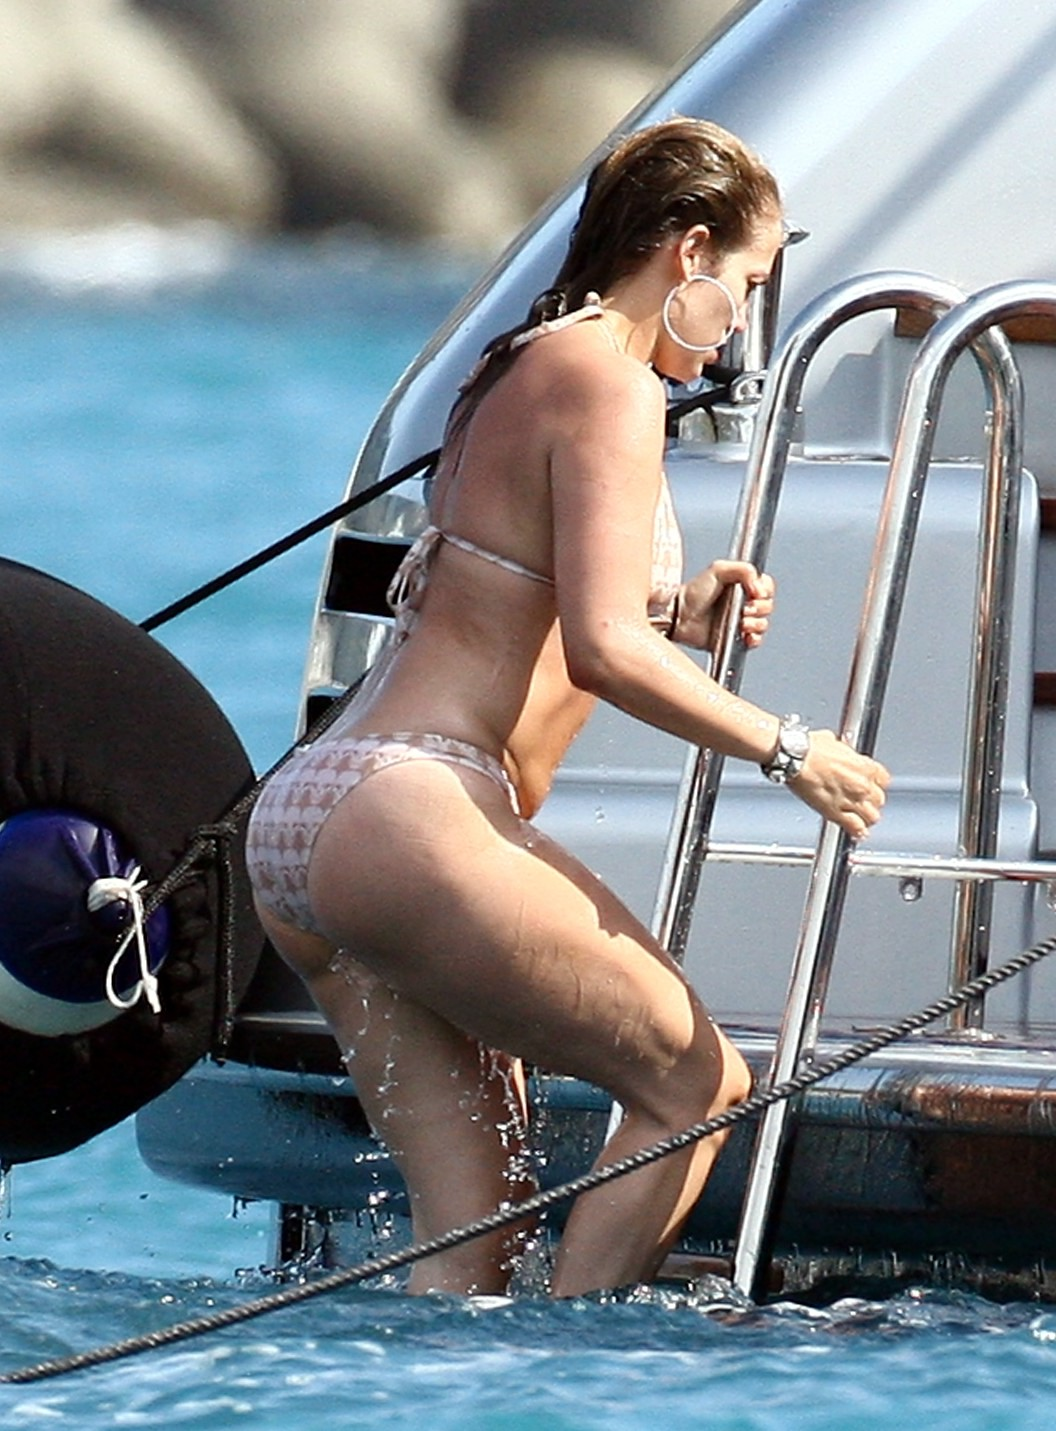 http://1.bp.blogspot.com/-5G15EtWwKY0/TpcMOSz2m6I/AAAAAAAABco/yd4EWGGT4SM/s1600/Jennifer+Lopez+Bikini+%25283%2529.jpg